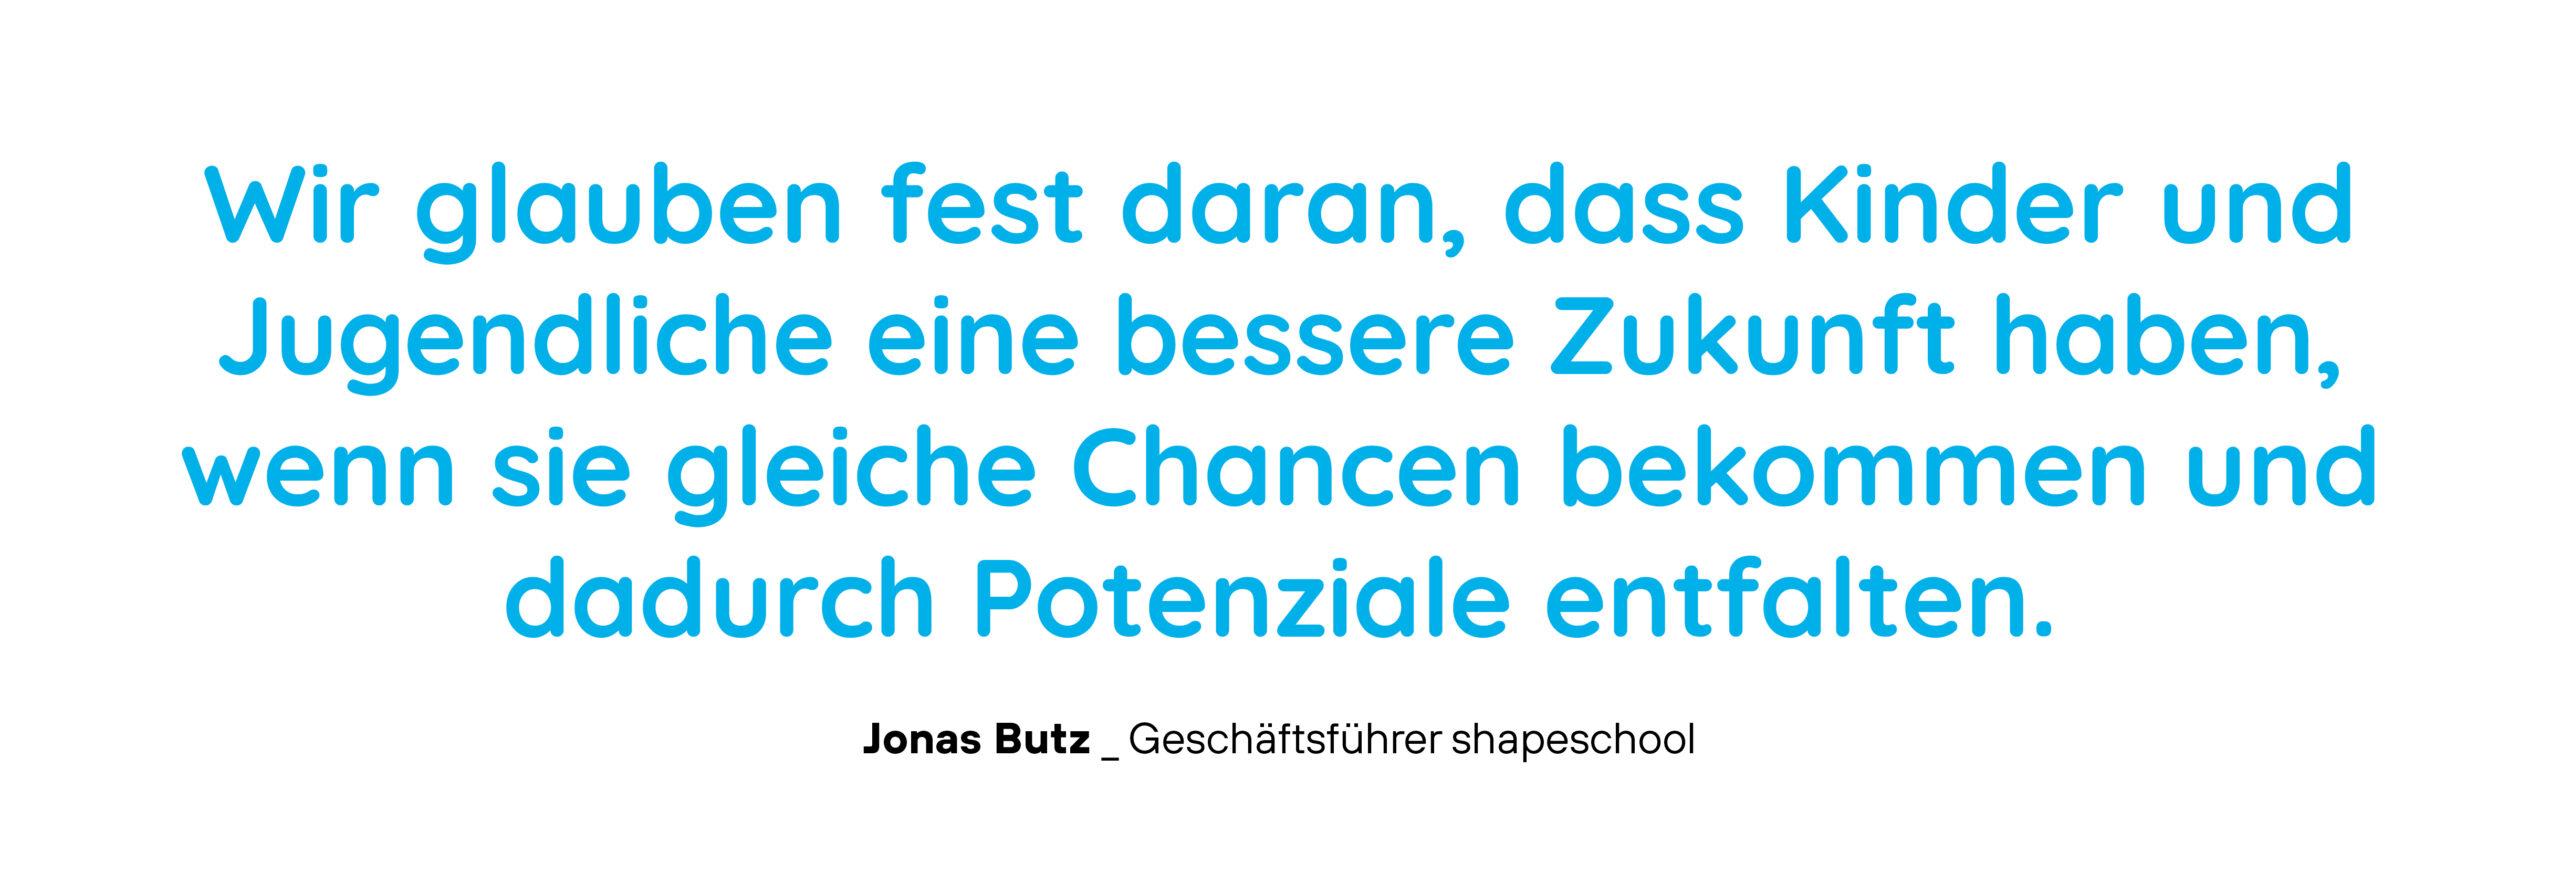 Statement_shapeschool-2